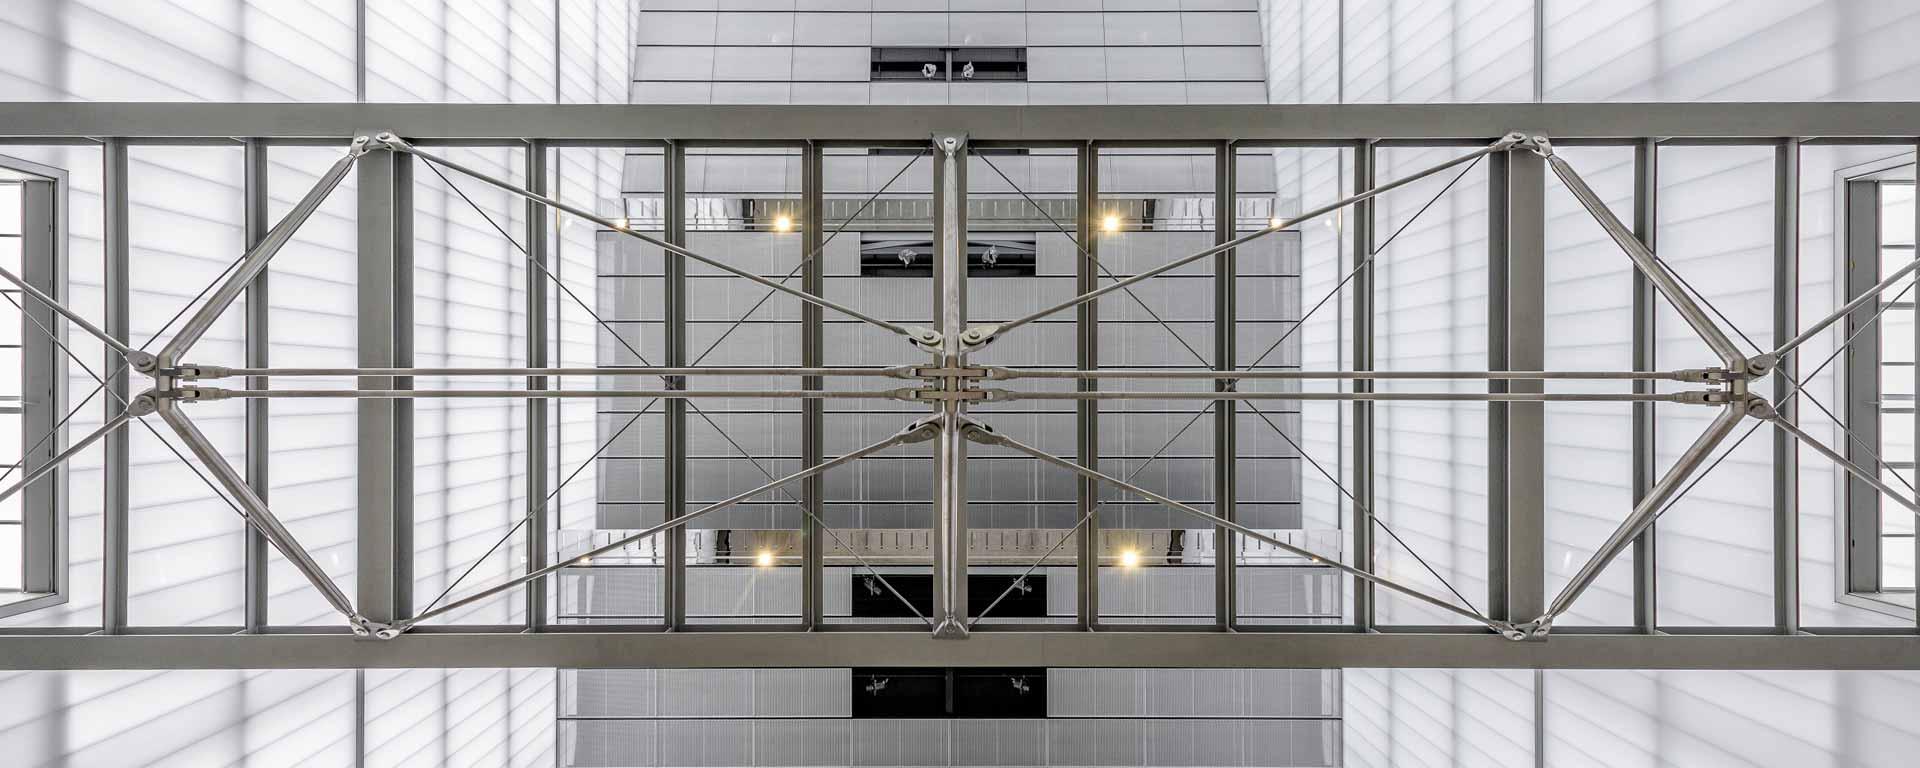 Ronstan Tensile Architecture